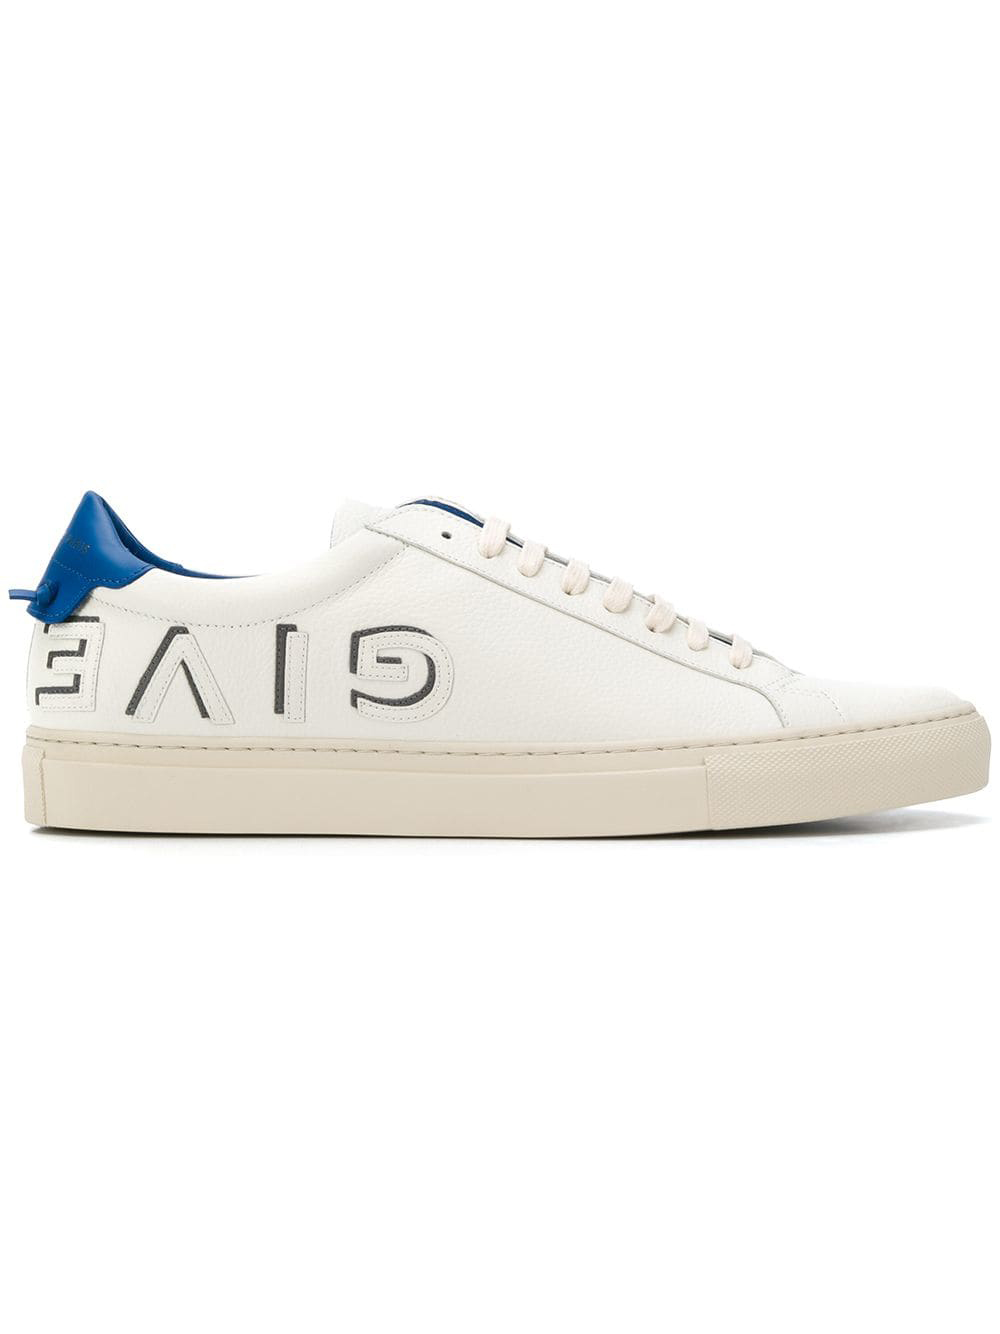 sneakers-givenchy-lesthete.jpg